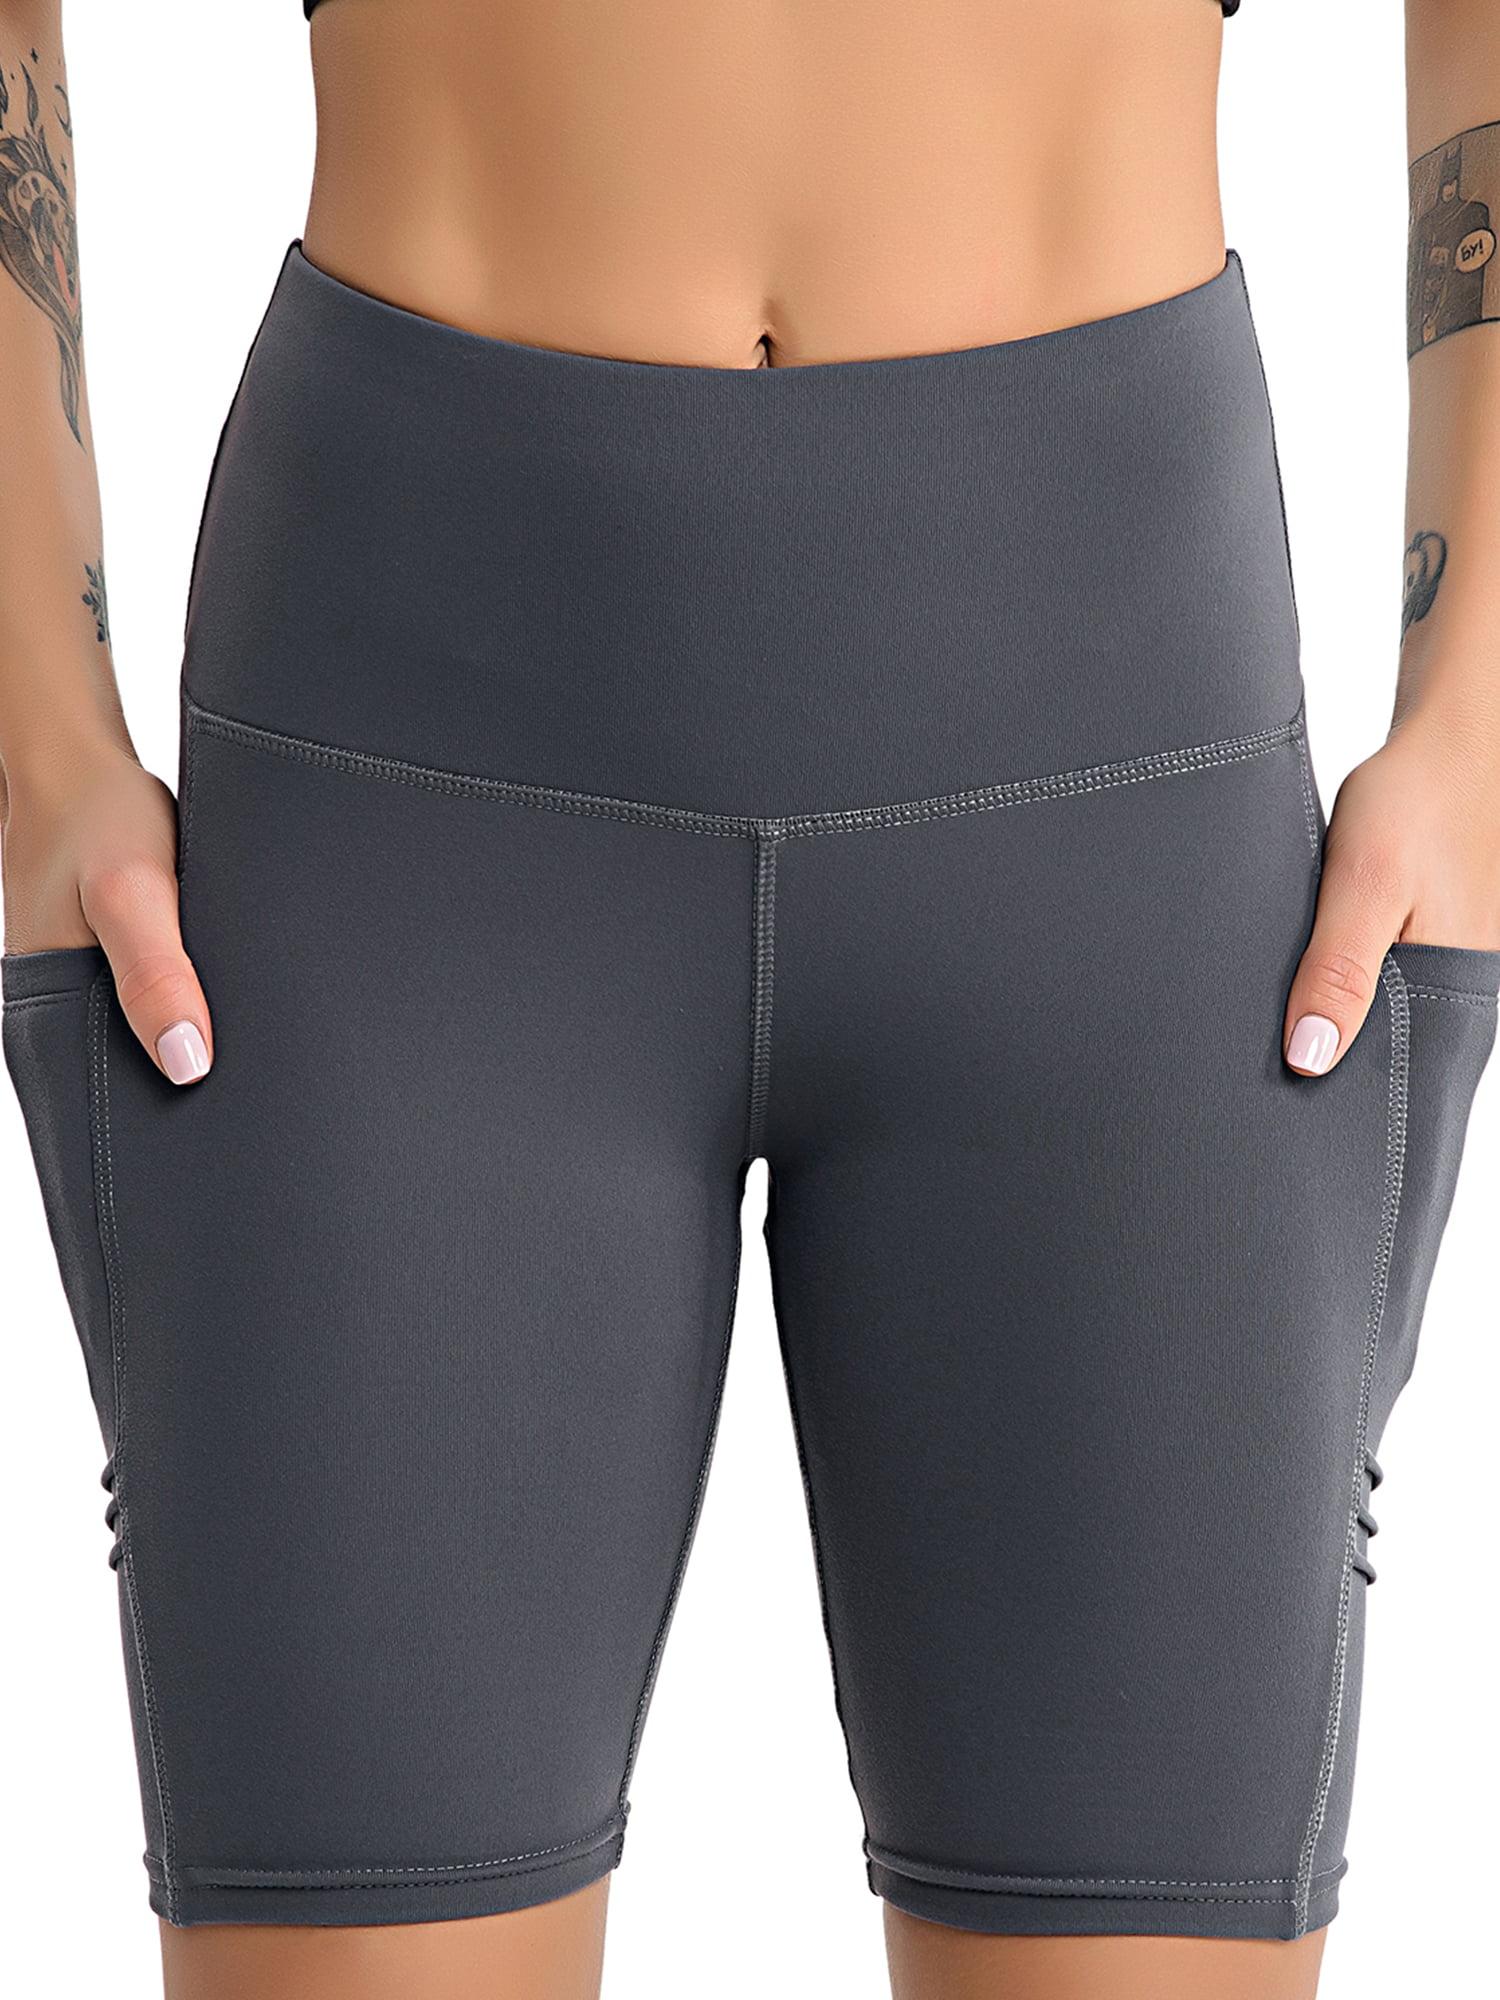 leving sporty shorts Womens Sports Running Jogging Female Home Yoga Fitness Shorts Beach Shorts